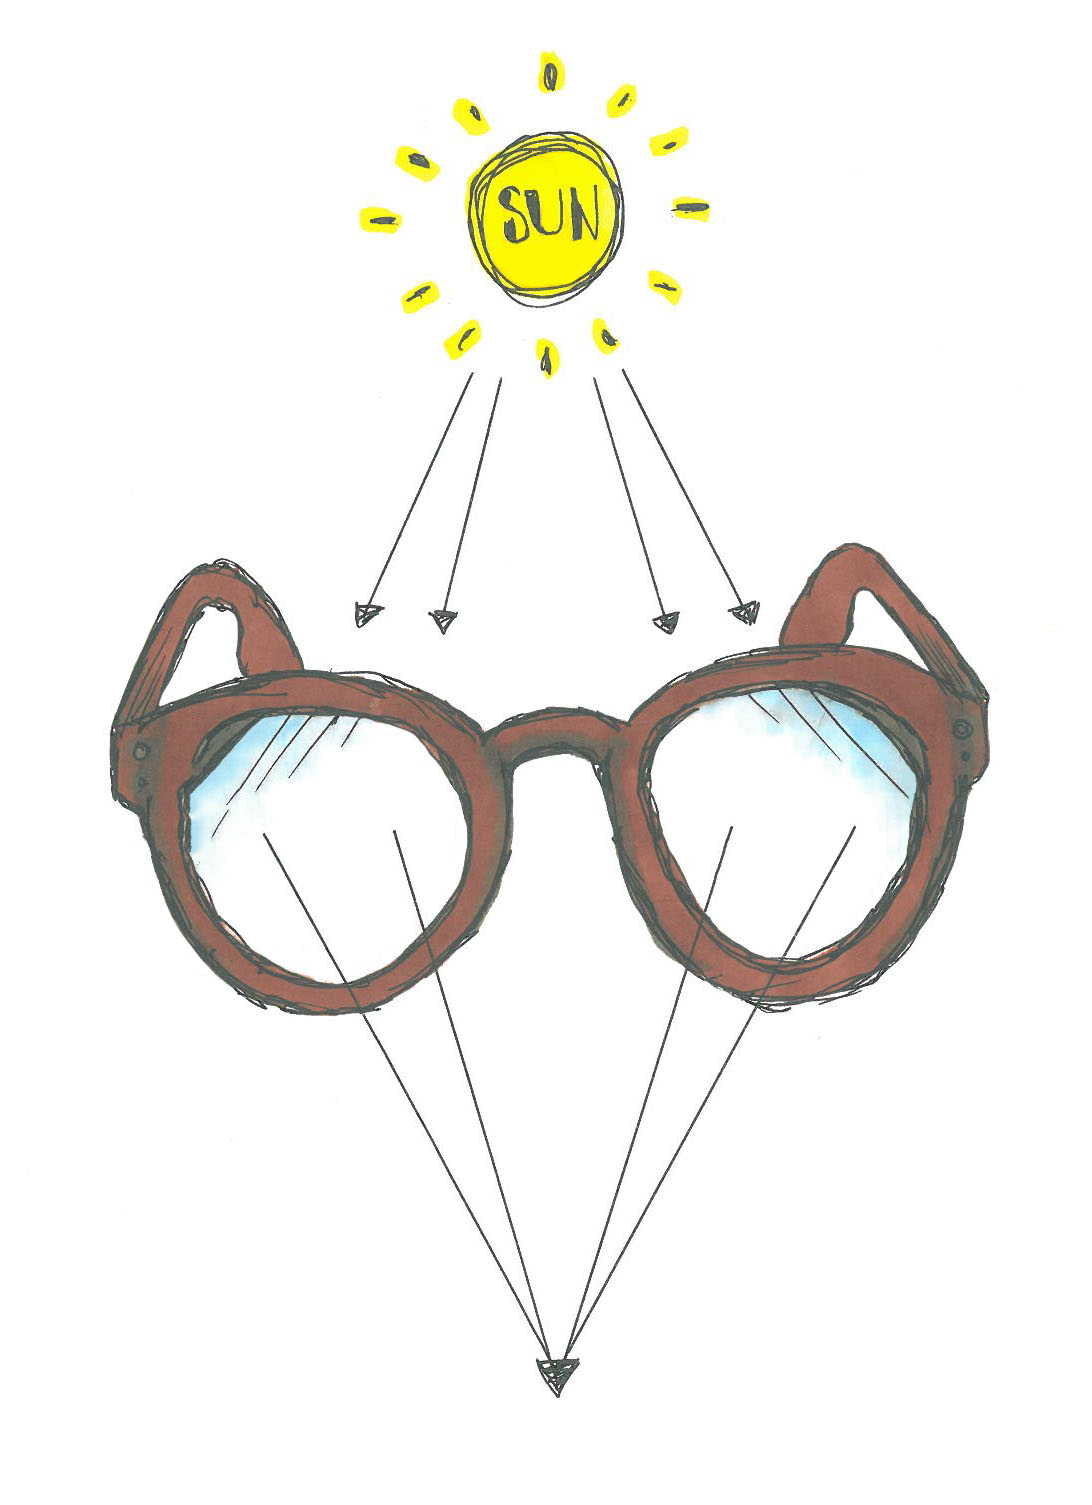 adventure children's book science image reviews image